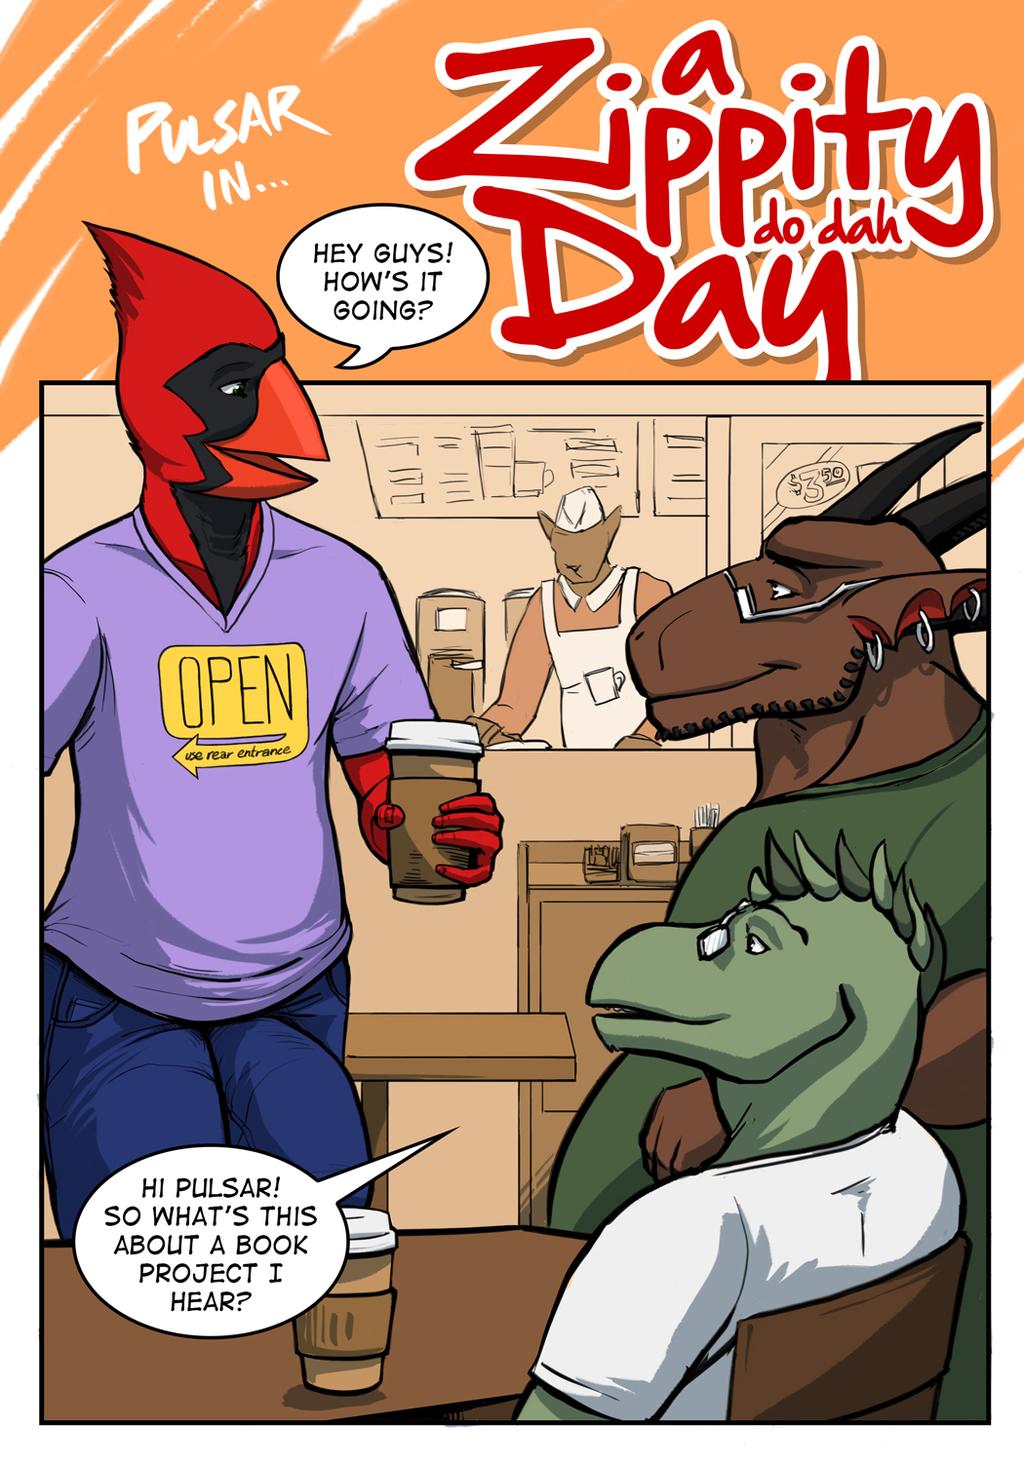 A Zippity Do Dah Day - Page 1 of 7